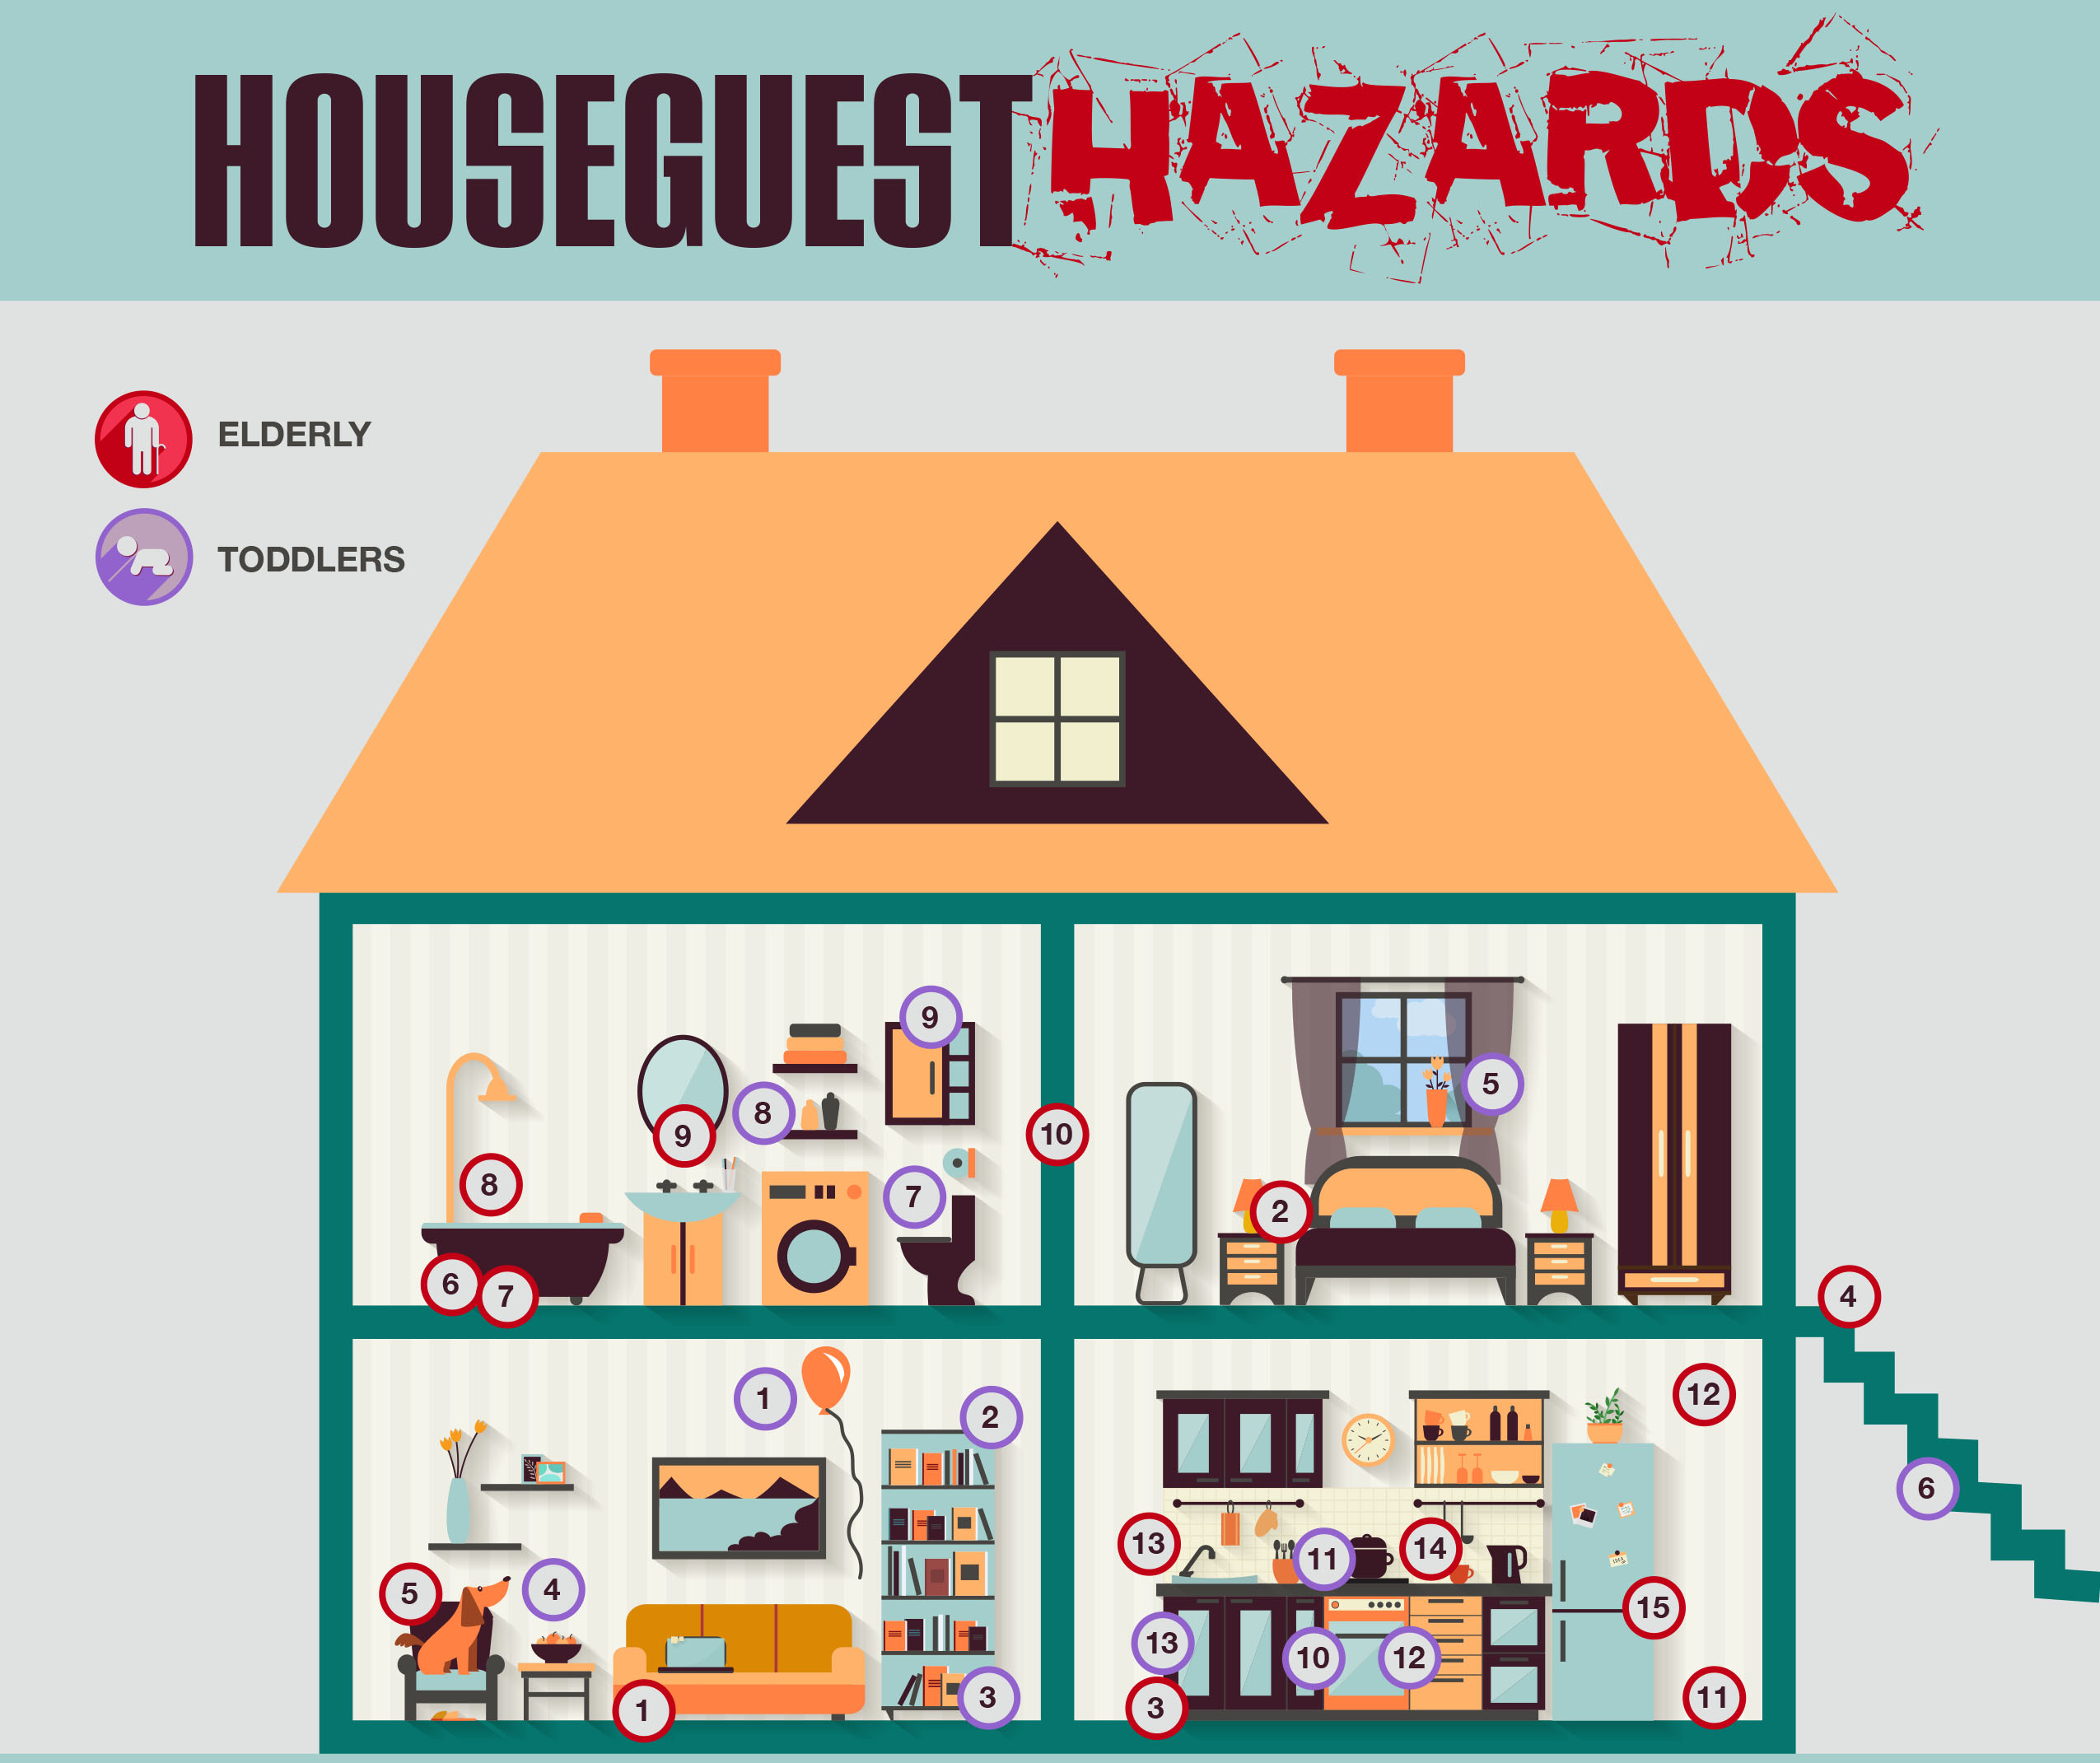 Southern Oak Insurance Houseguest Hazards